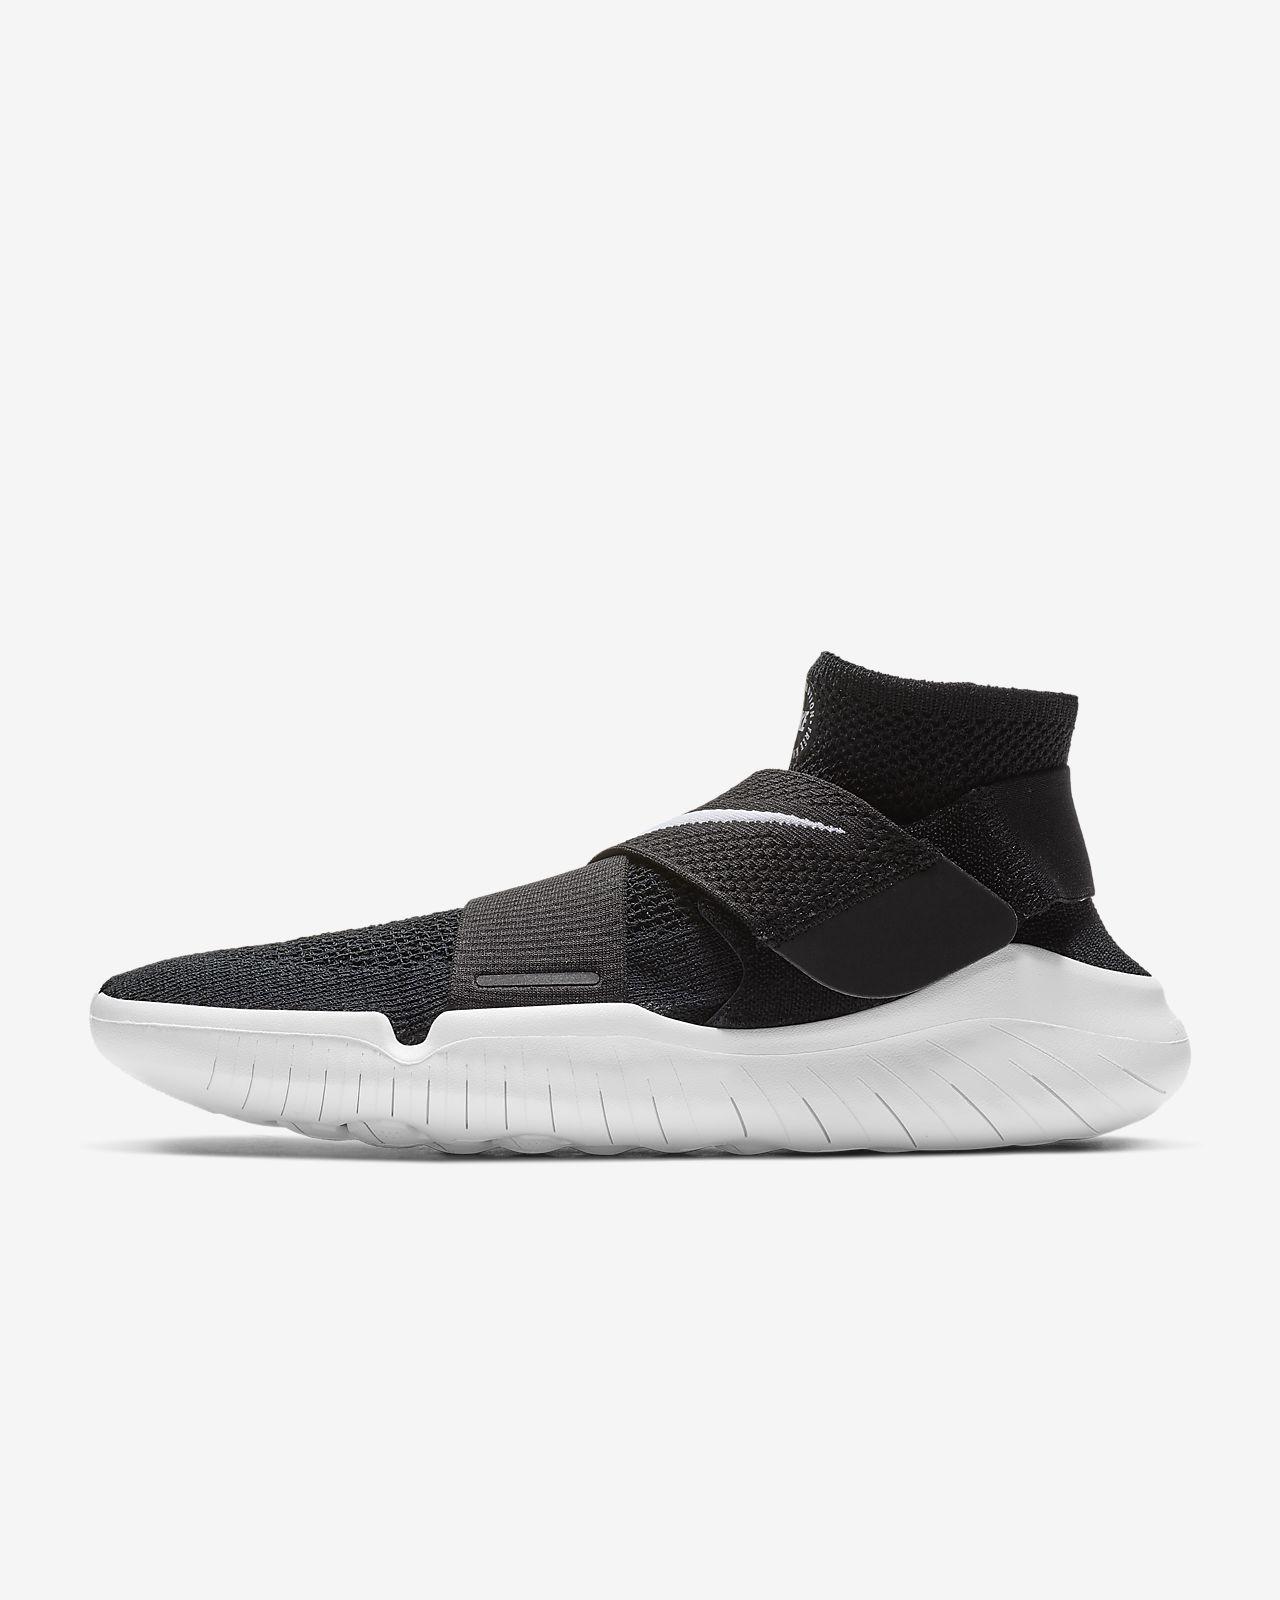 Nike Free RN Motion Flyknit 2018 男款跑鞋